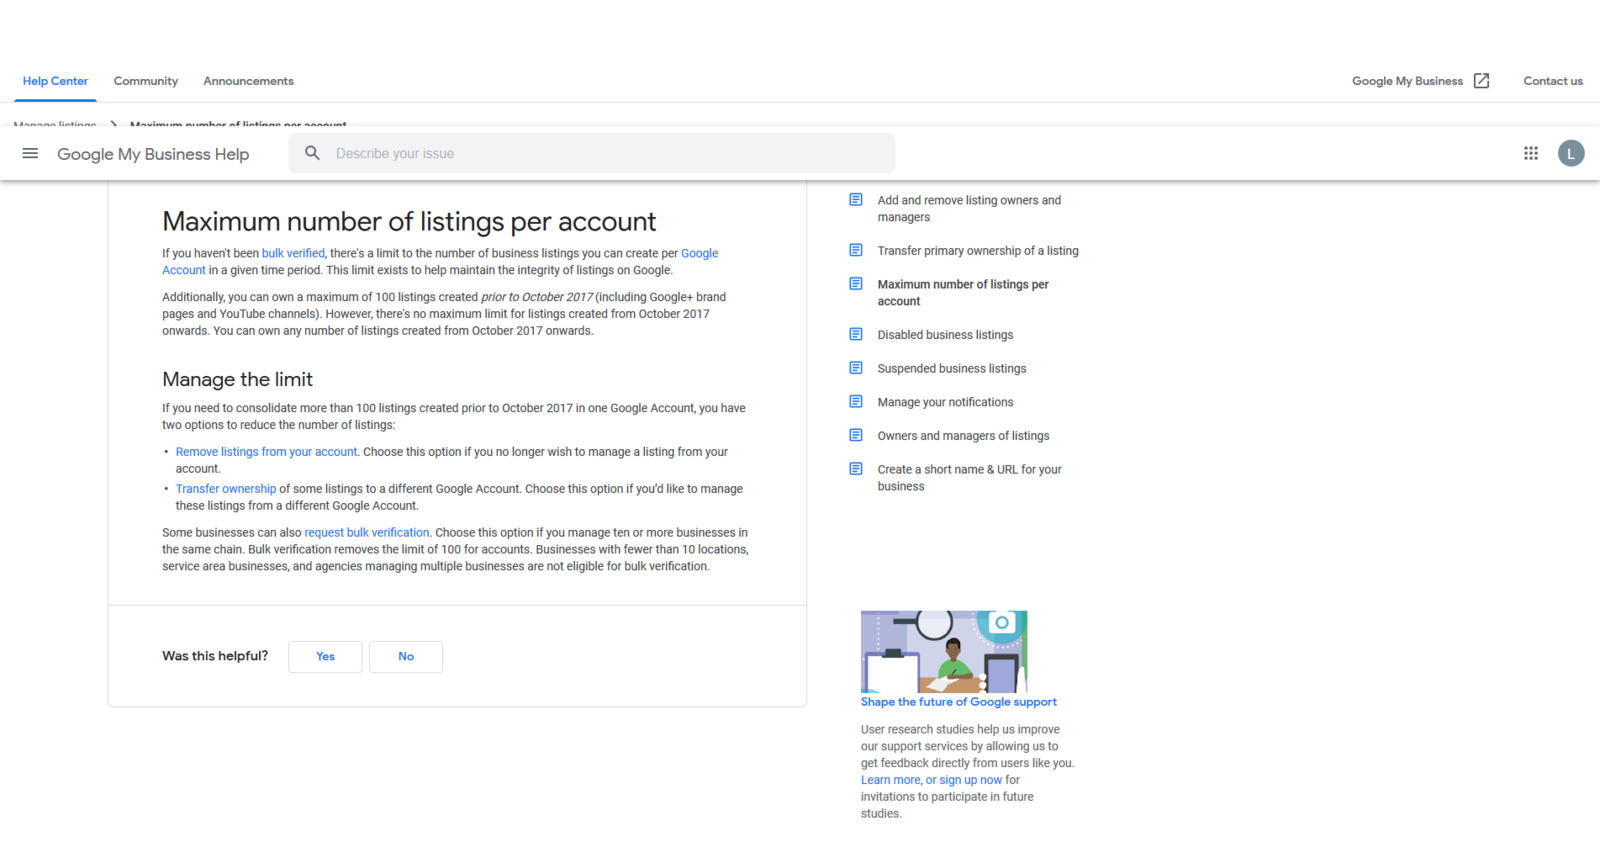 Screenshot_2019-09-05 Maximum number of listings per account - Google My Business Help.png